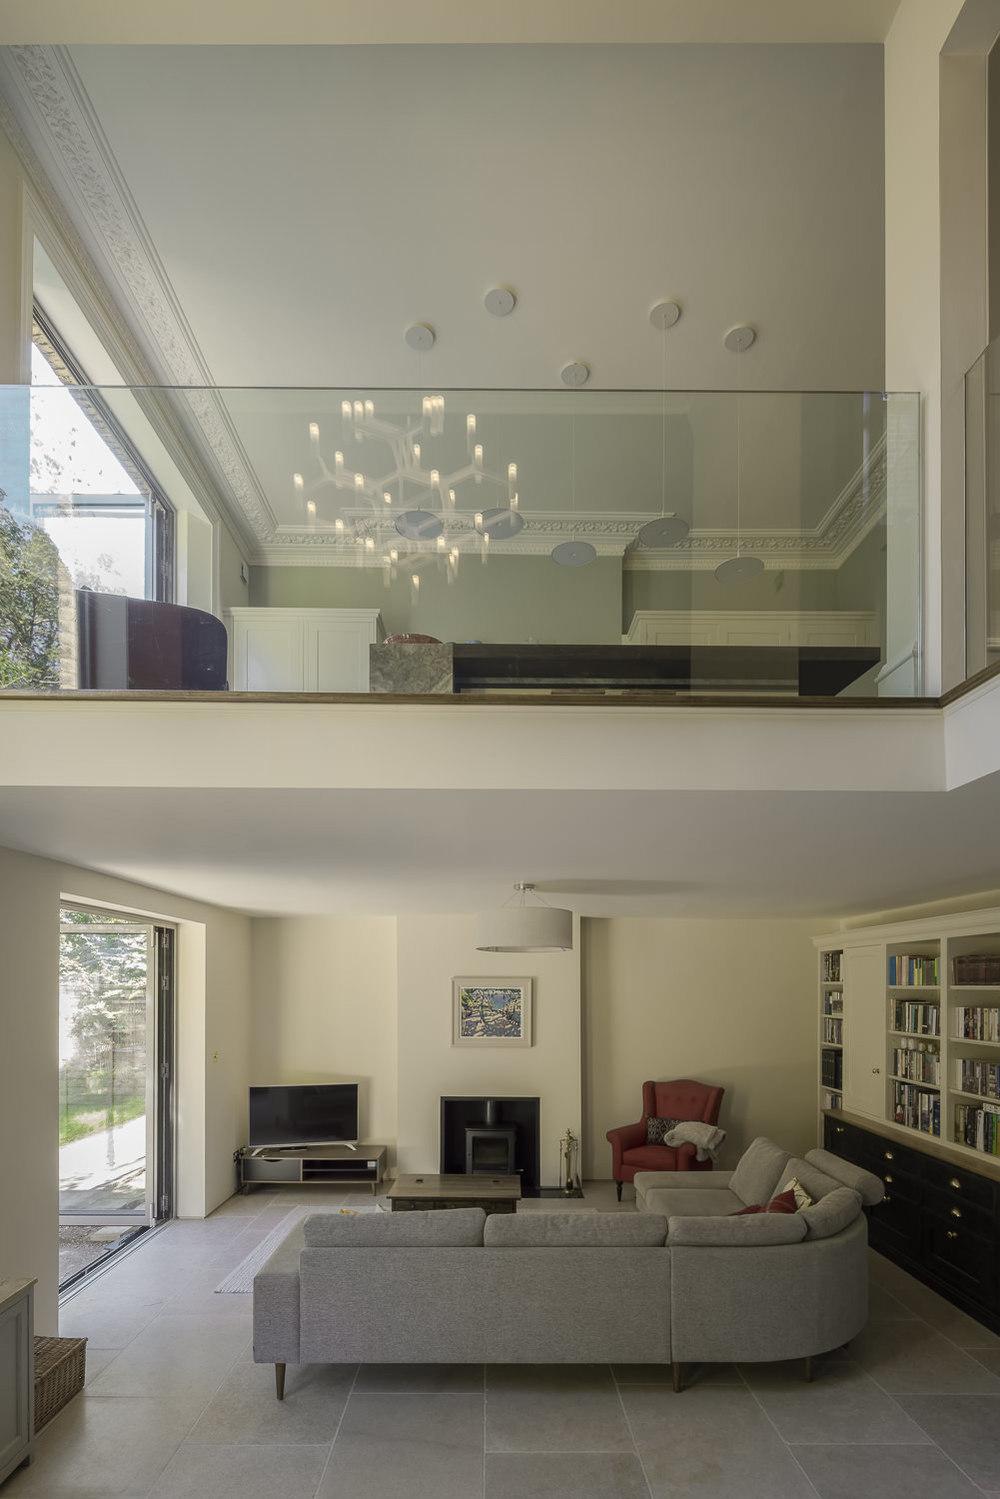 mark-hadden-architecture-photographer-architectuur-interieur-fotografie-london-amsterdam-nimtim-157-Edit.jpg